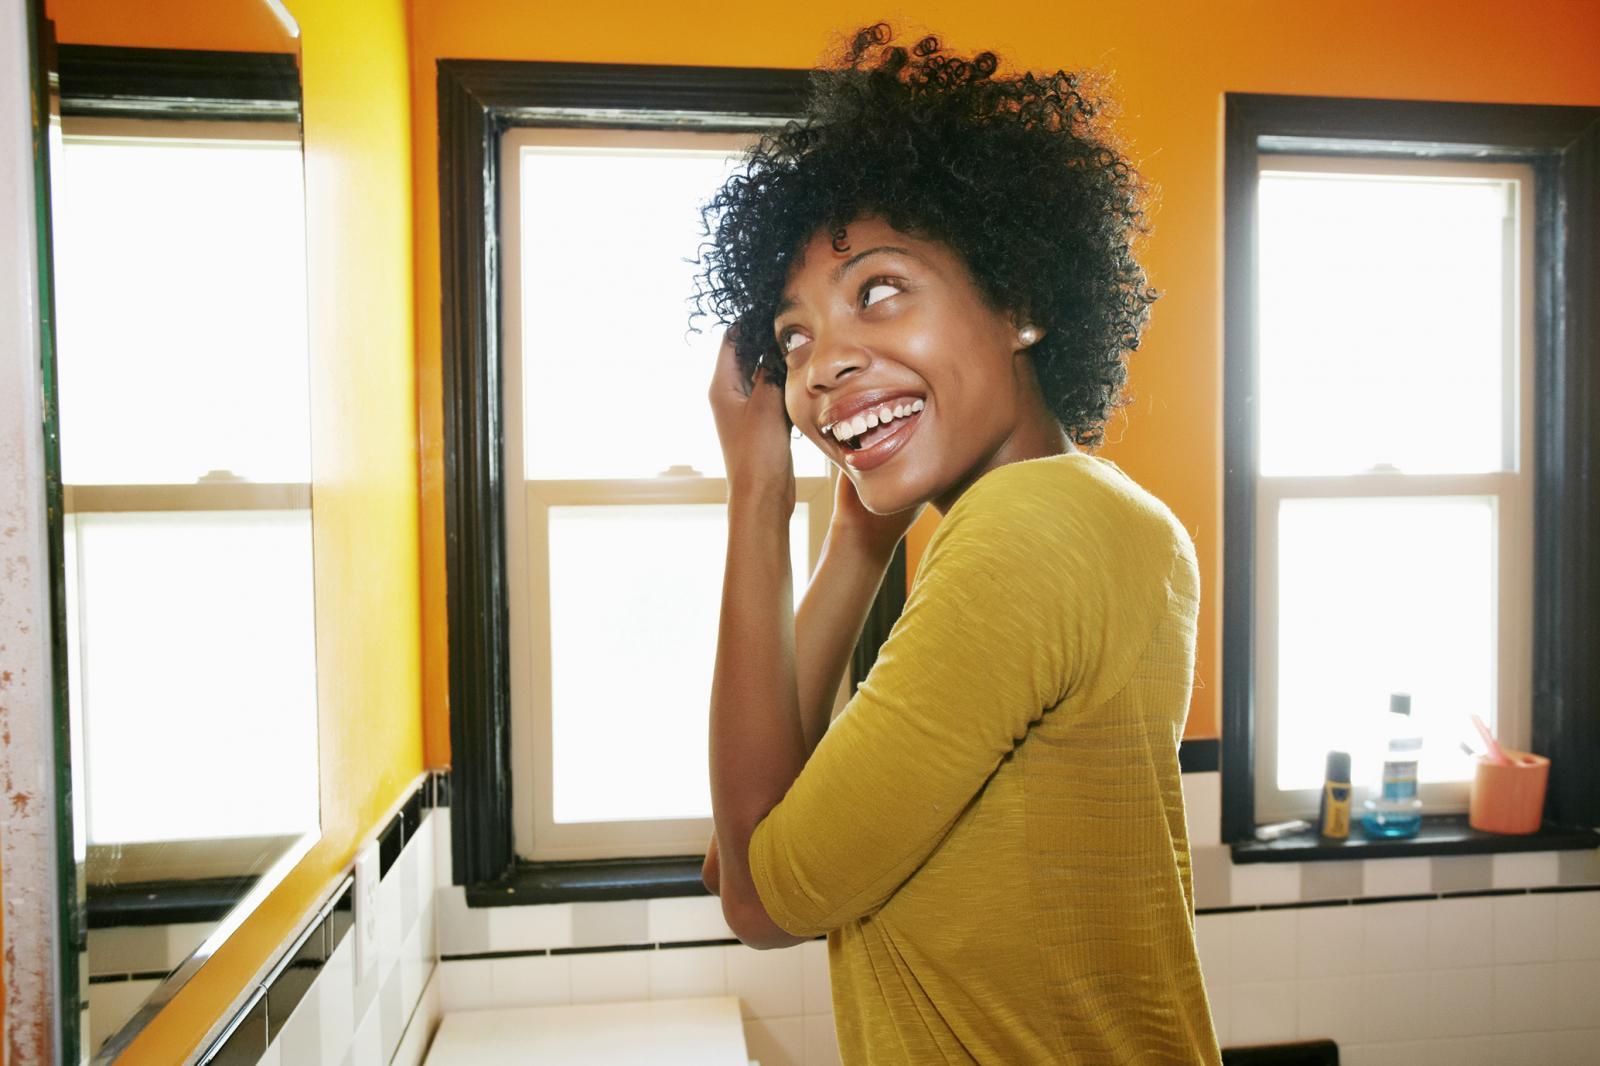 African American woman styling hair in bathroom mirror